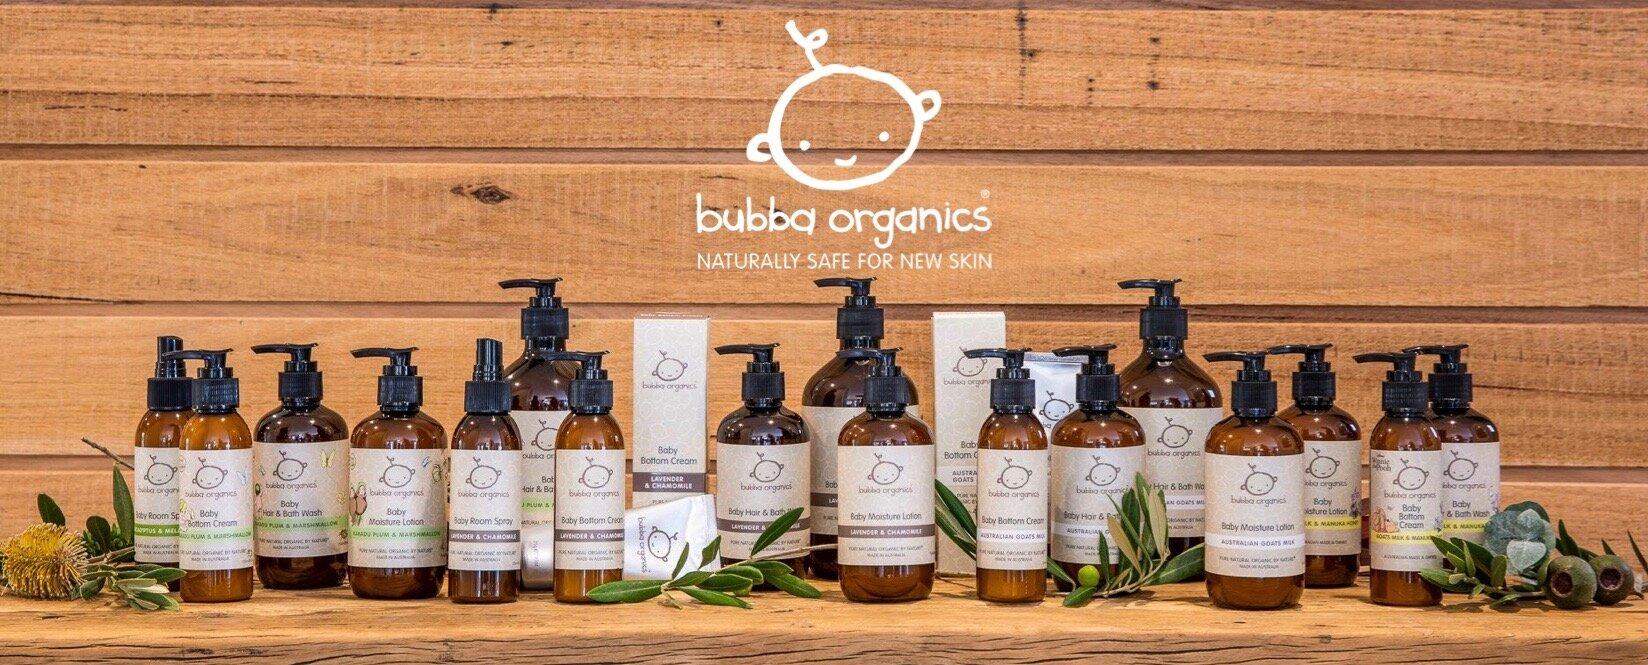 www.bubbaorganics.com.au